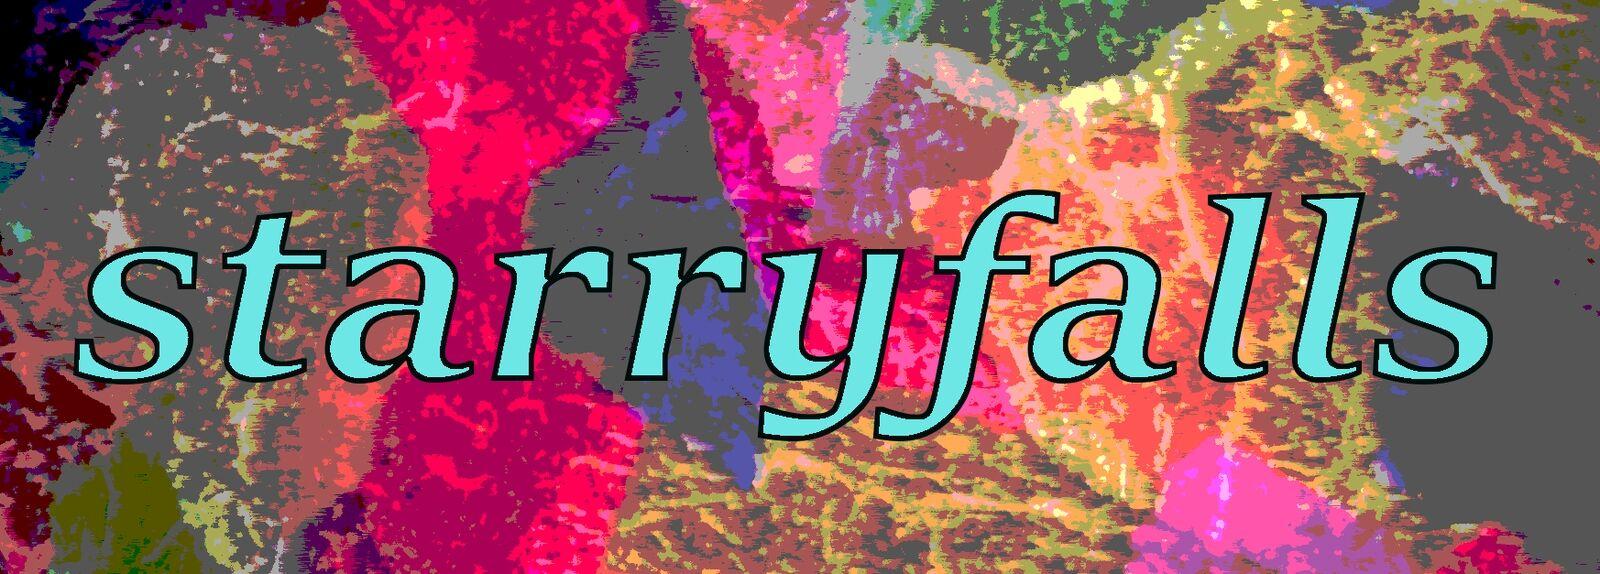 starryfalls